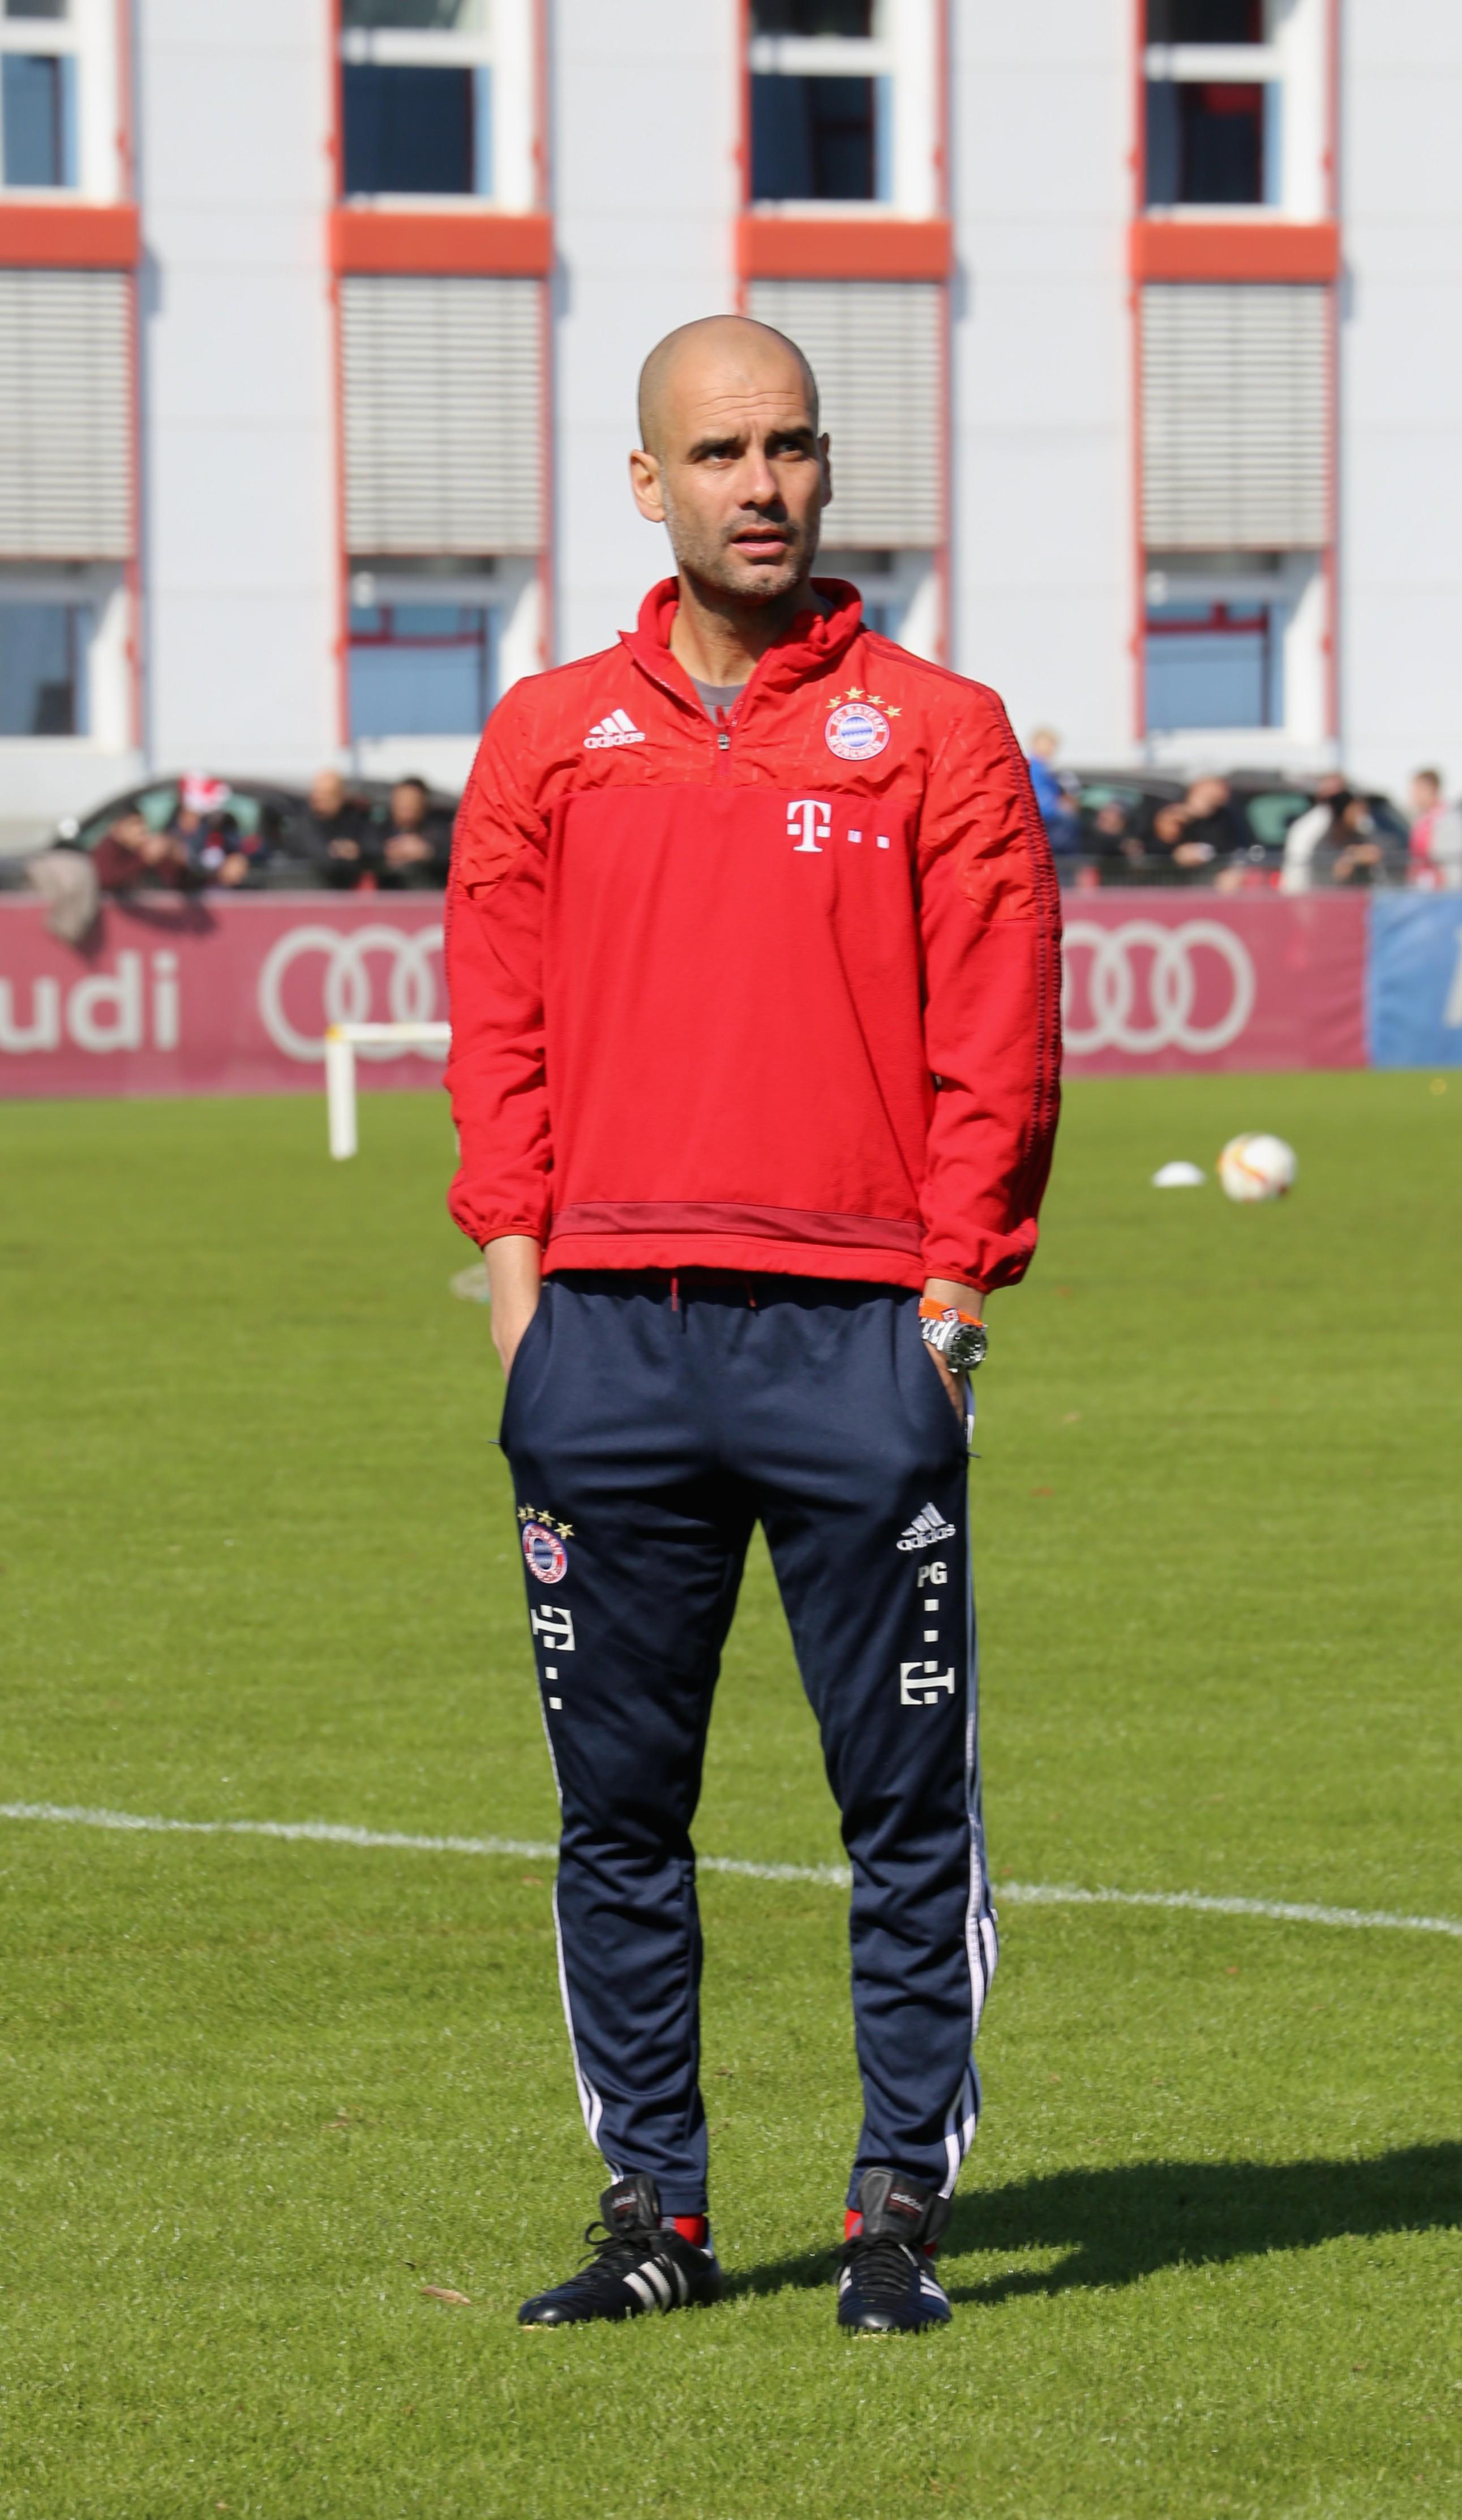 Trainer Pep Guardiola